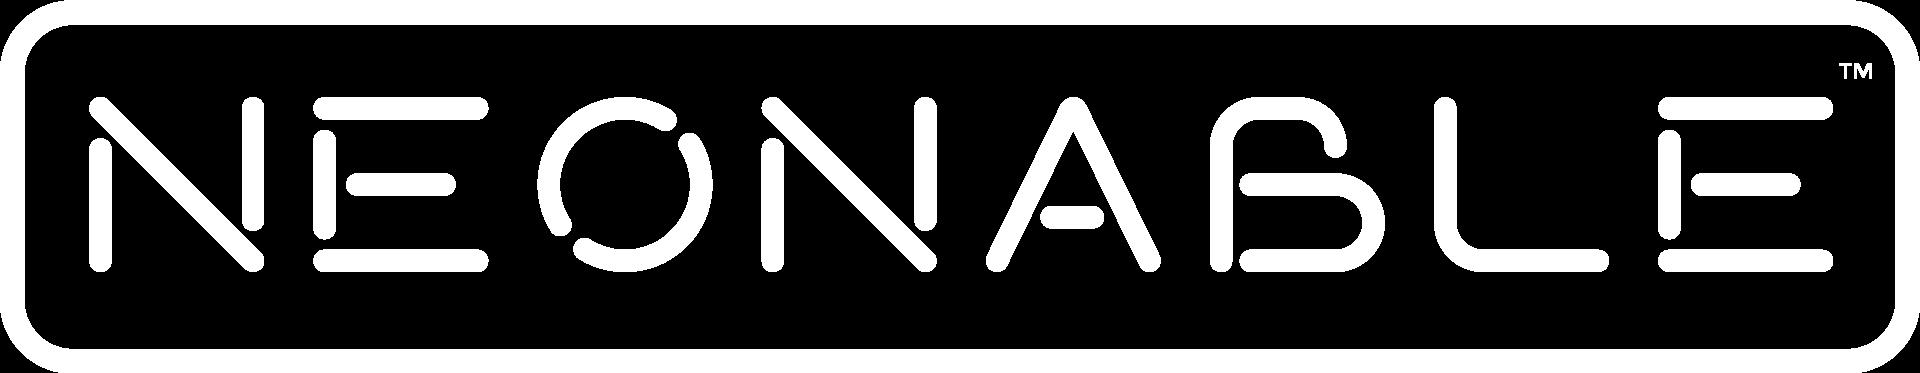 Neonable Logo White